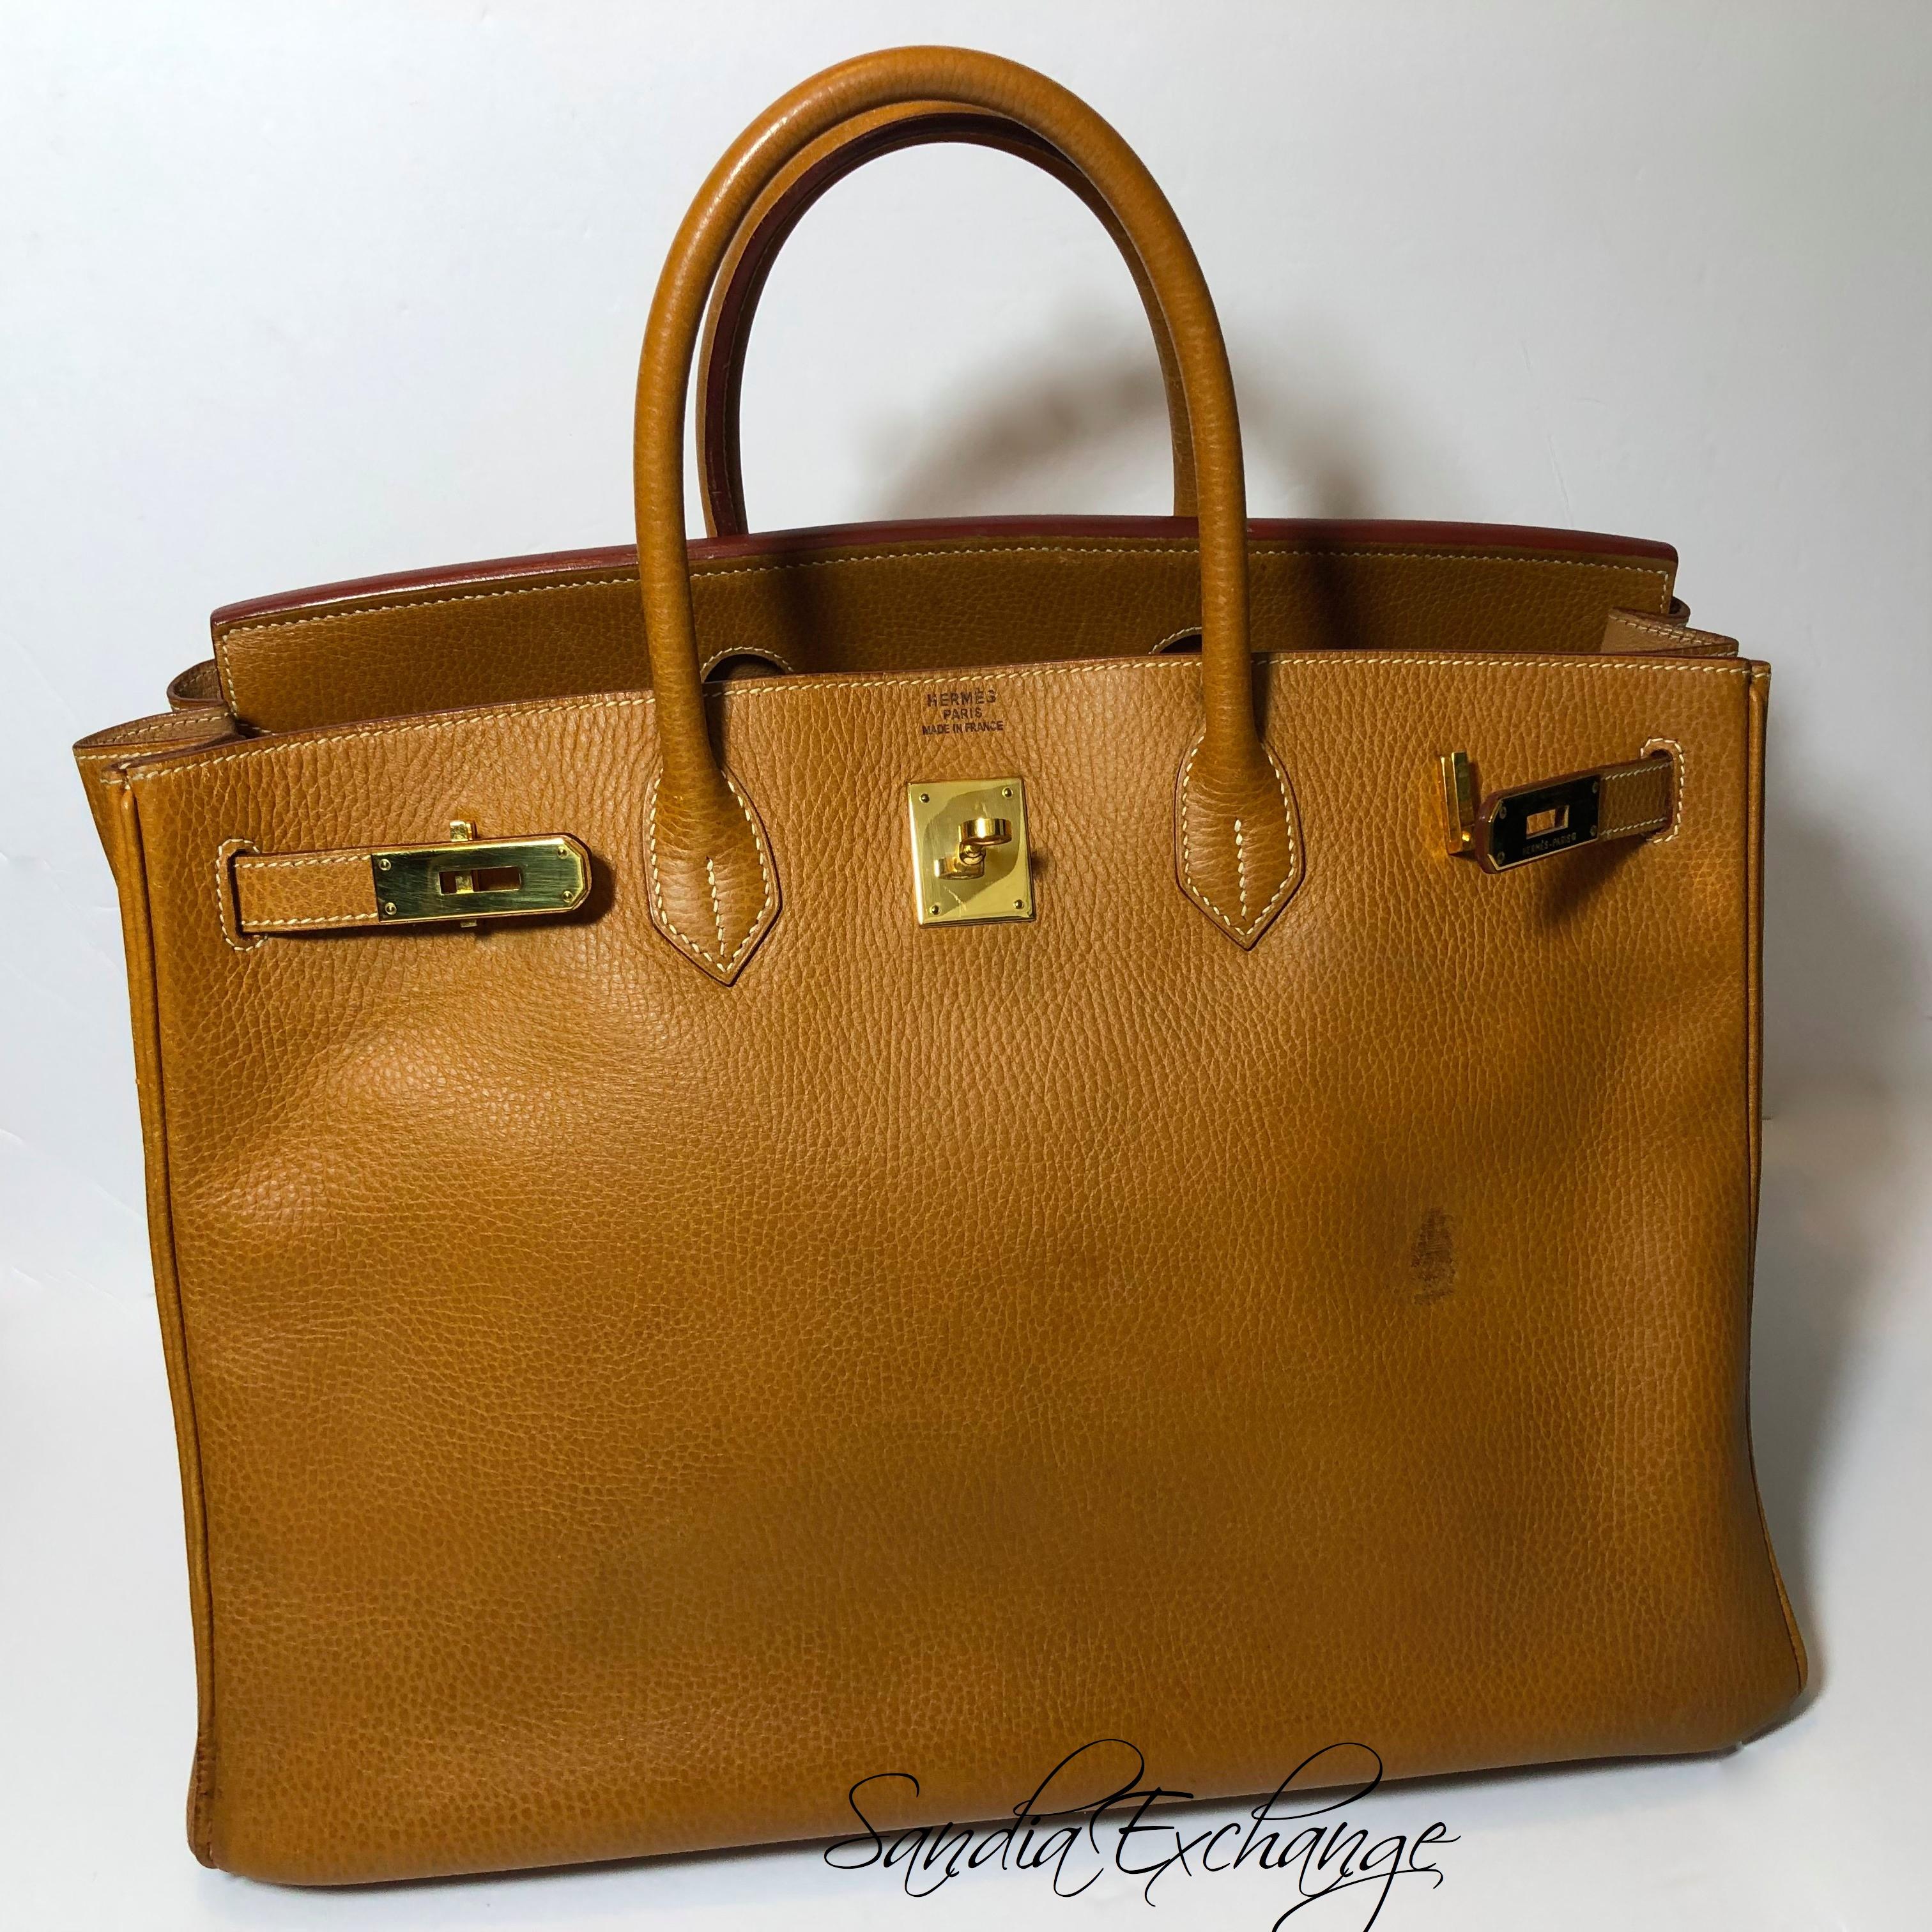 edcc43c387c6 Hermes Birkin 40 cm Gold Ardennes Gold Hardware Authentic Vintage ...